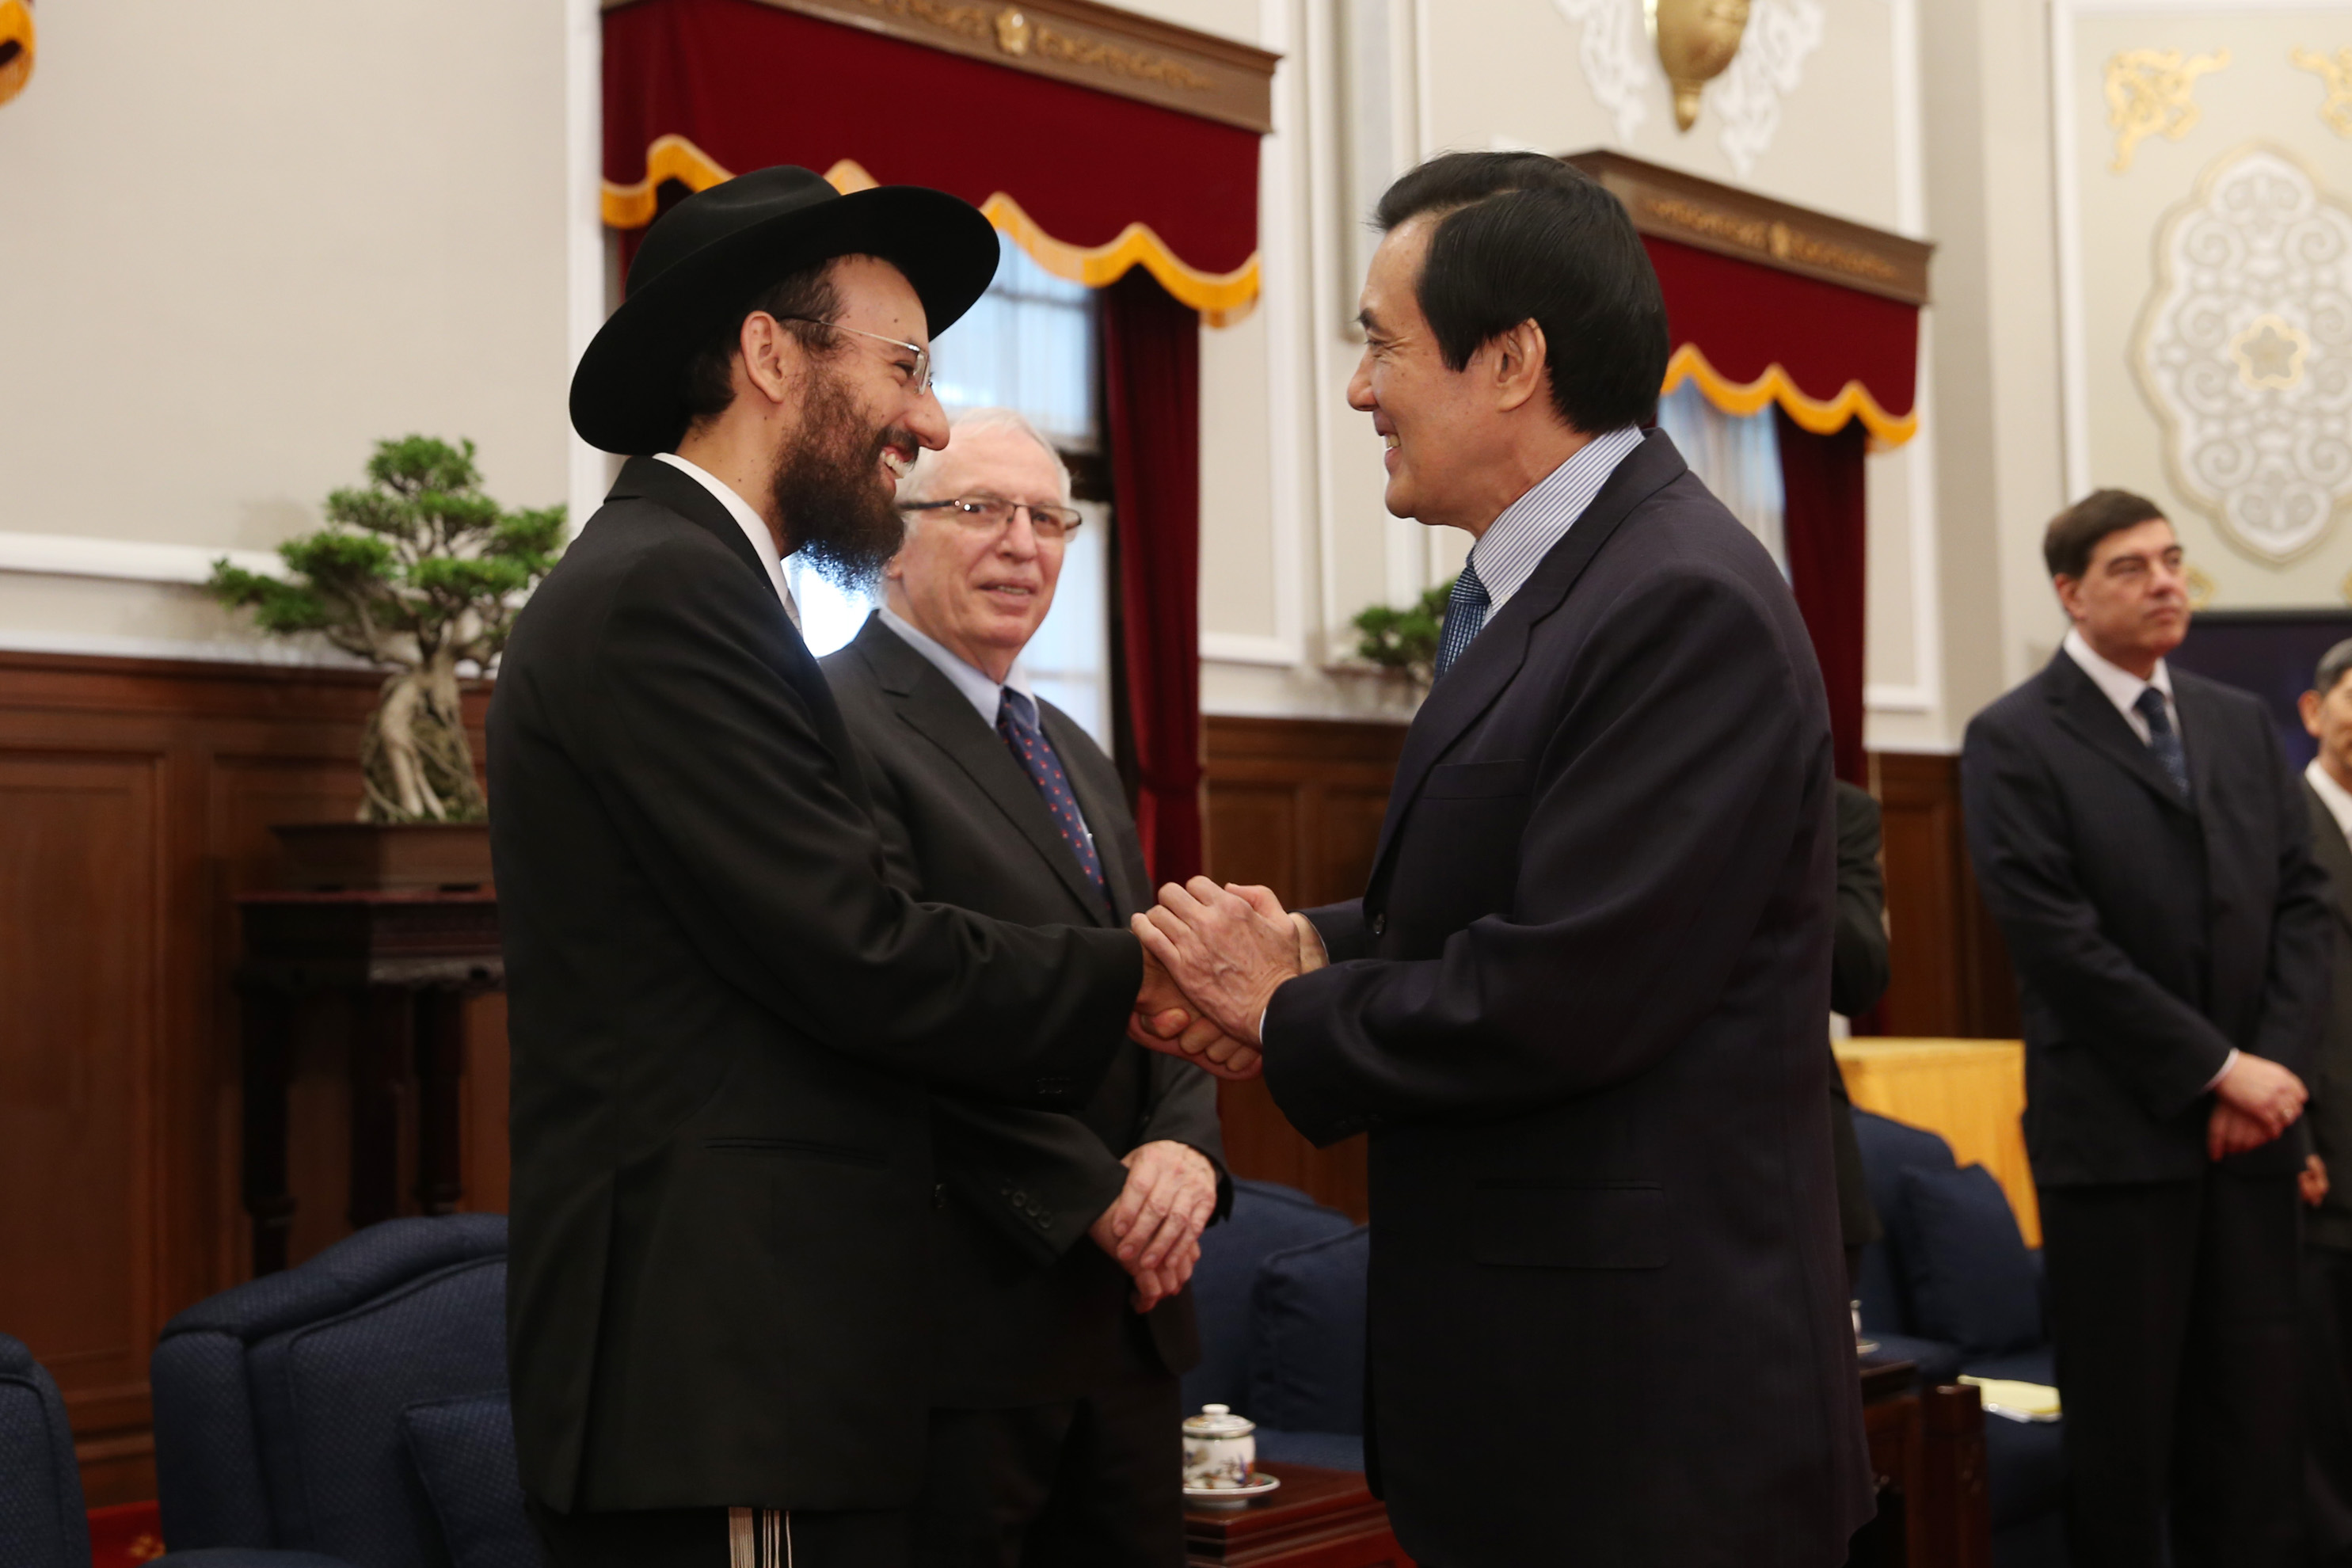 """Ros hasanakor 300-an vagyunk"" – a tajvani rabbi optimista"